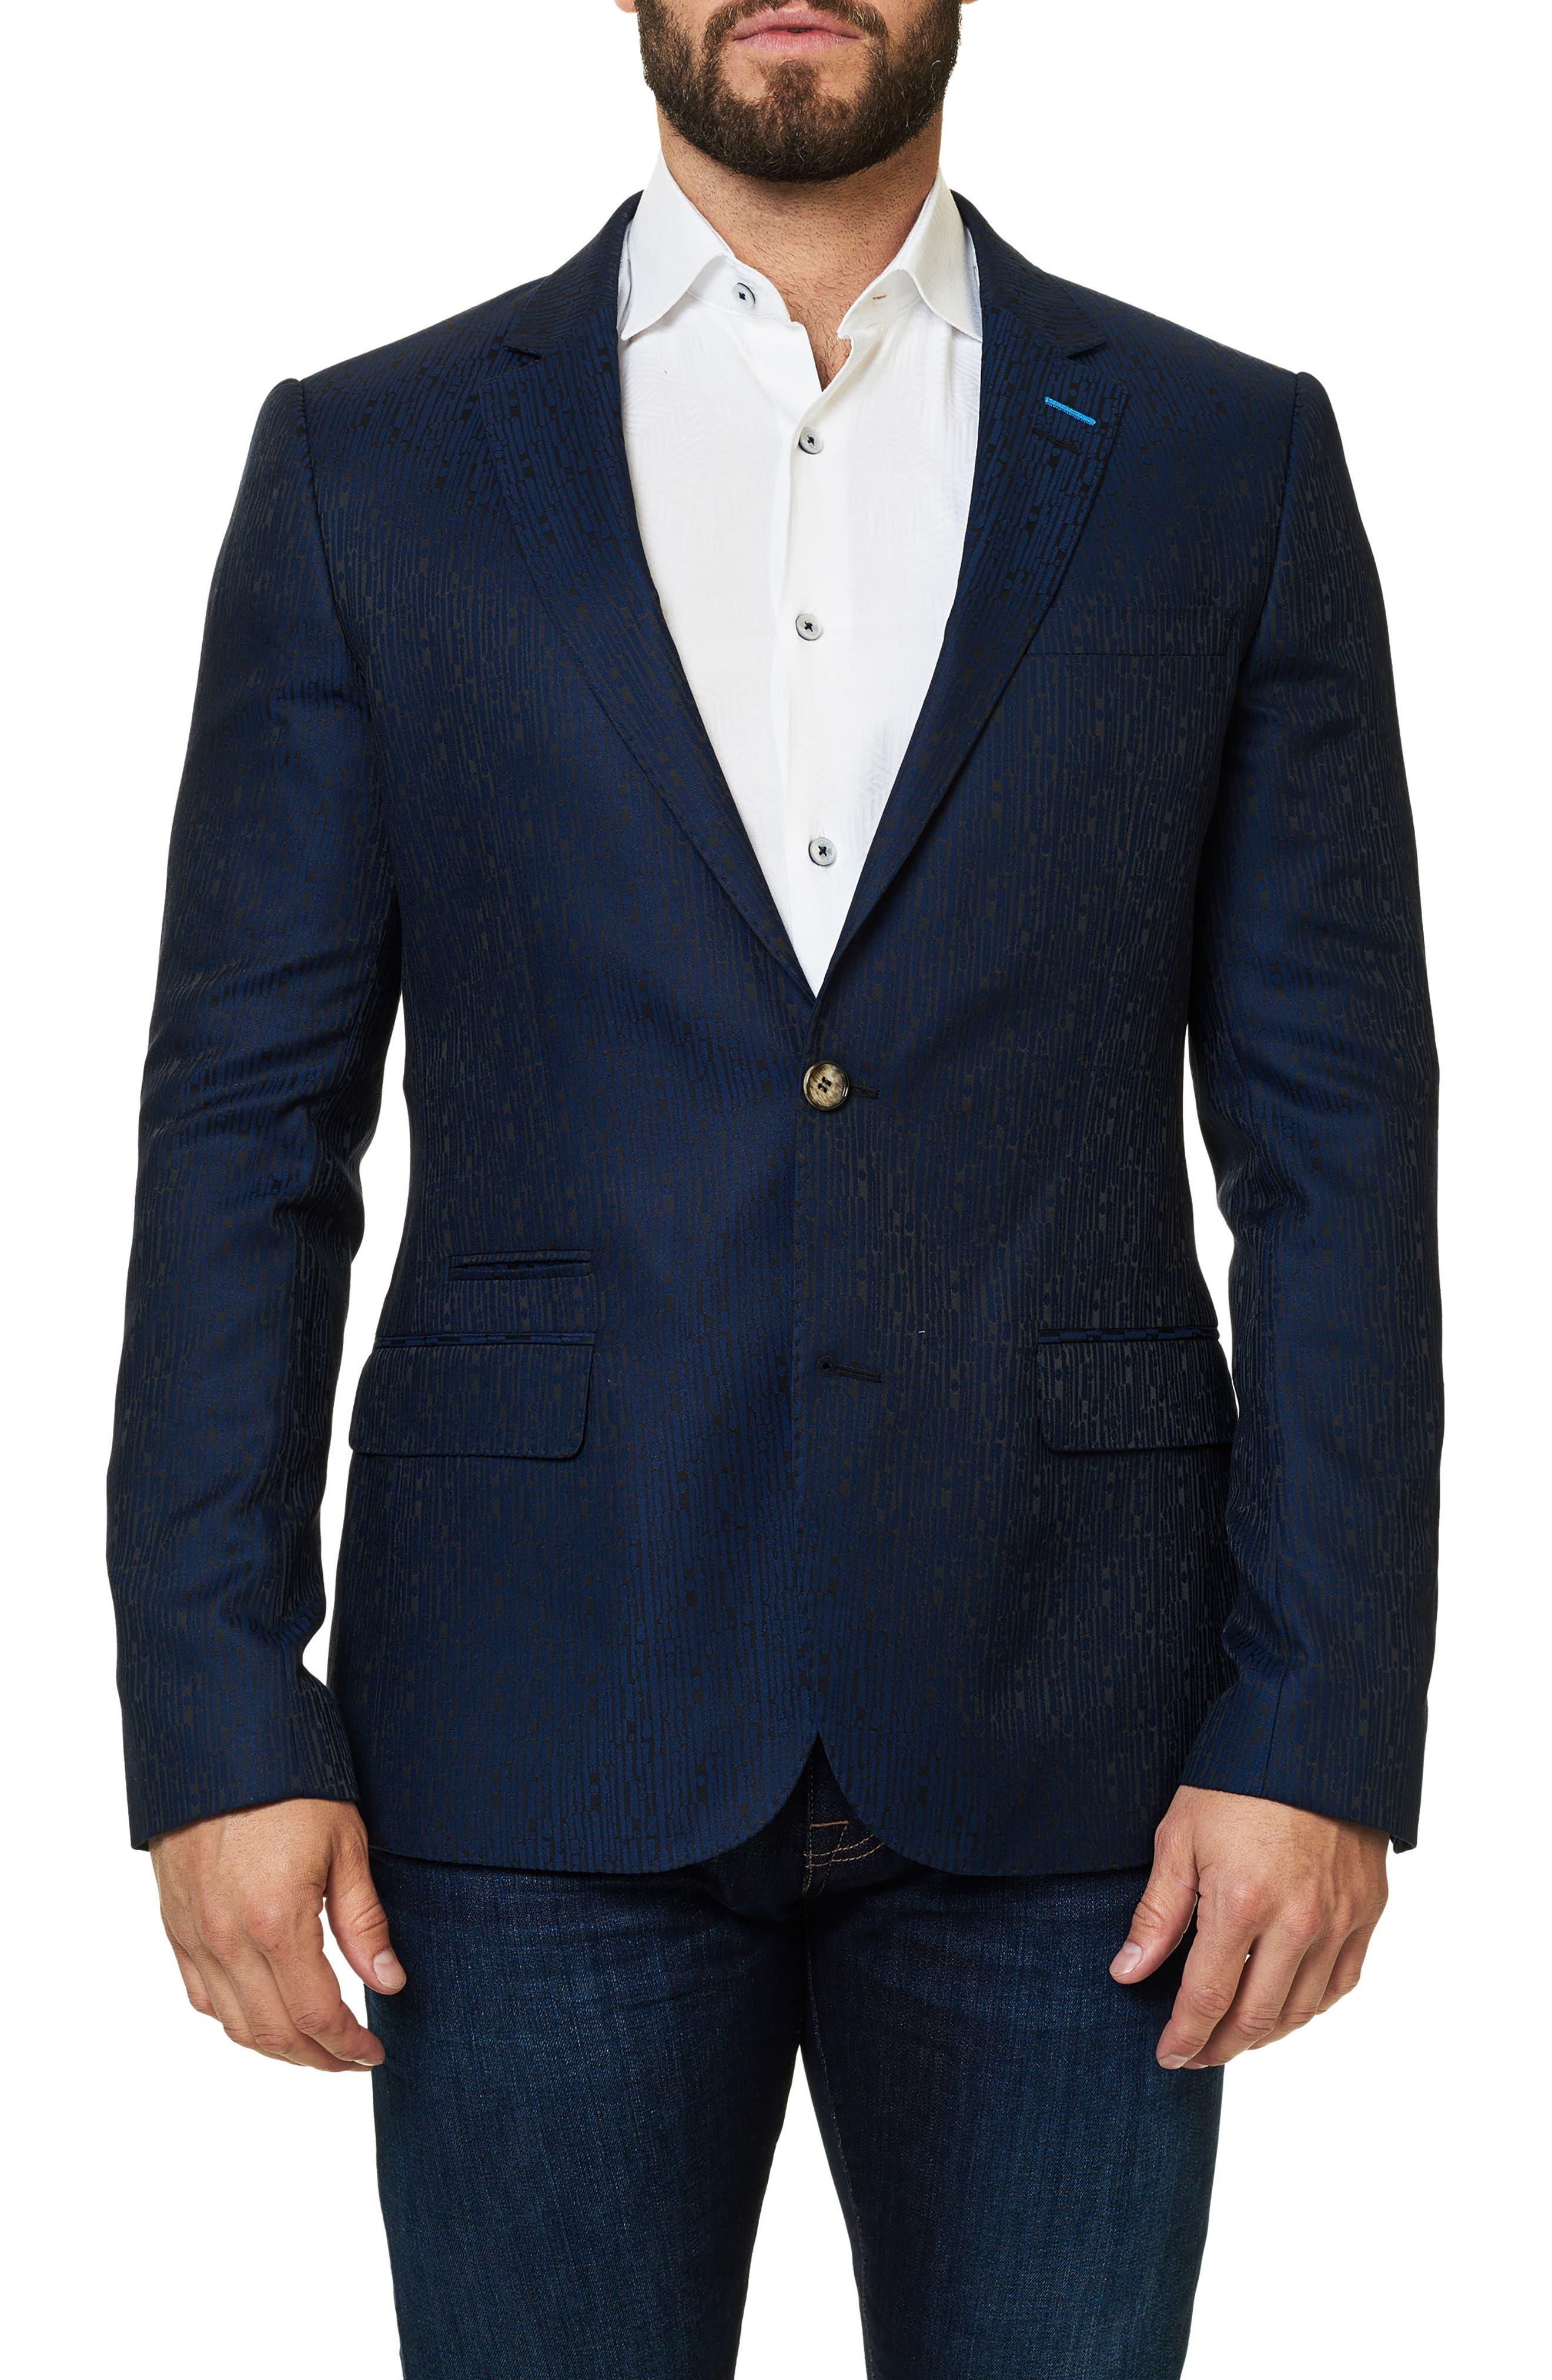 Main Image - Maceoo Socrate Jacquard Sport Coat